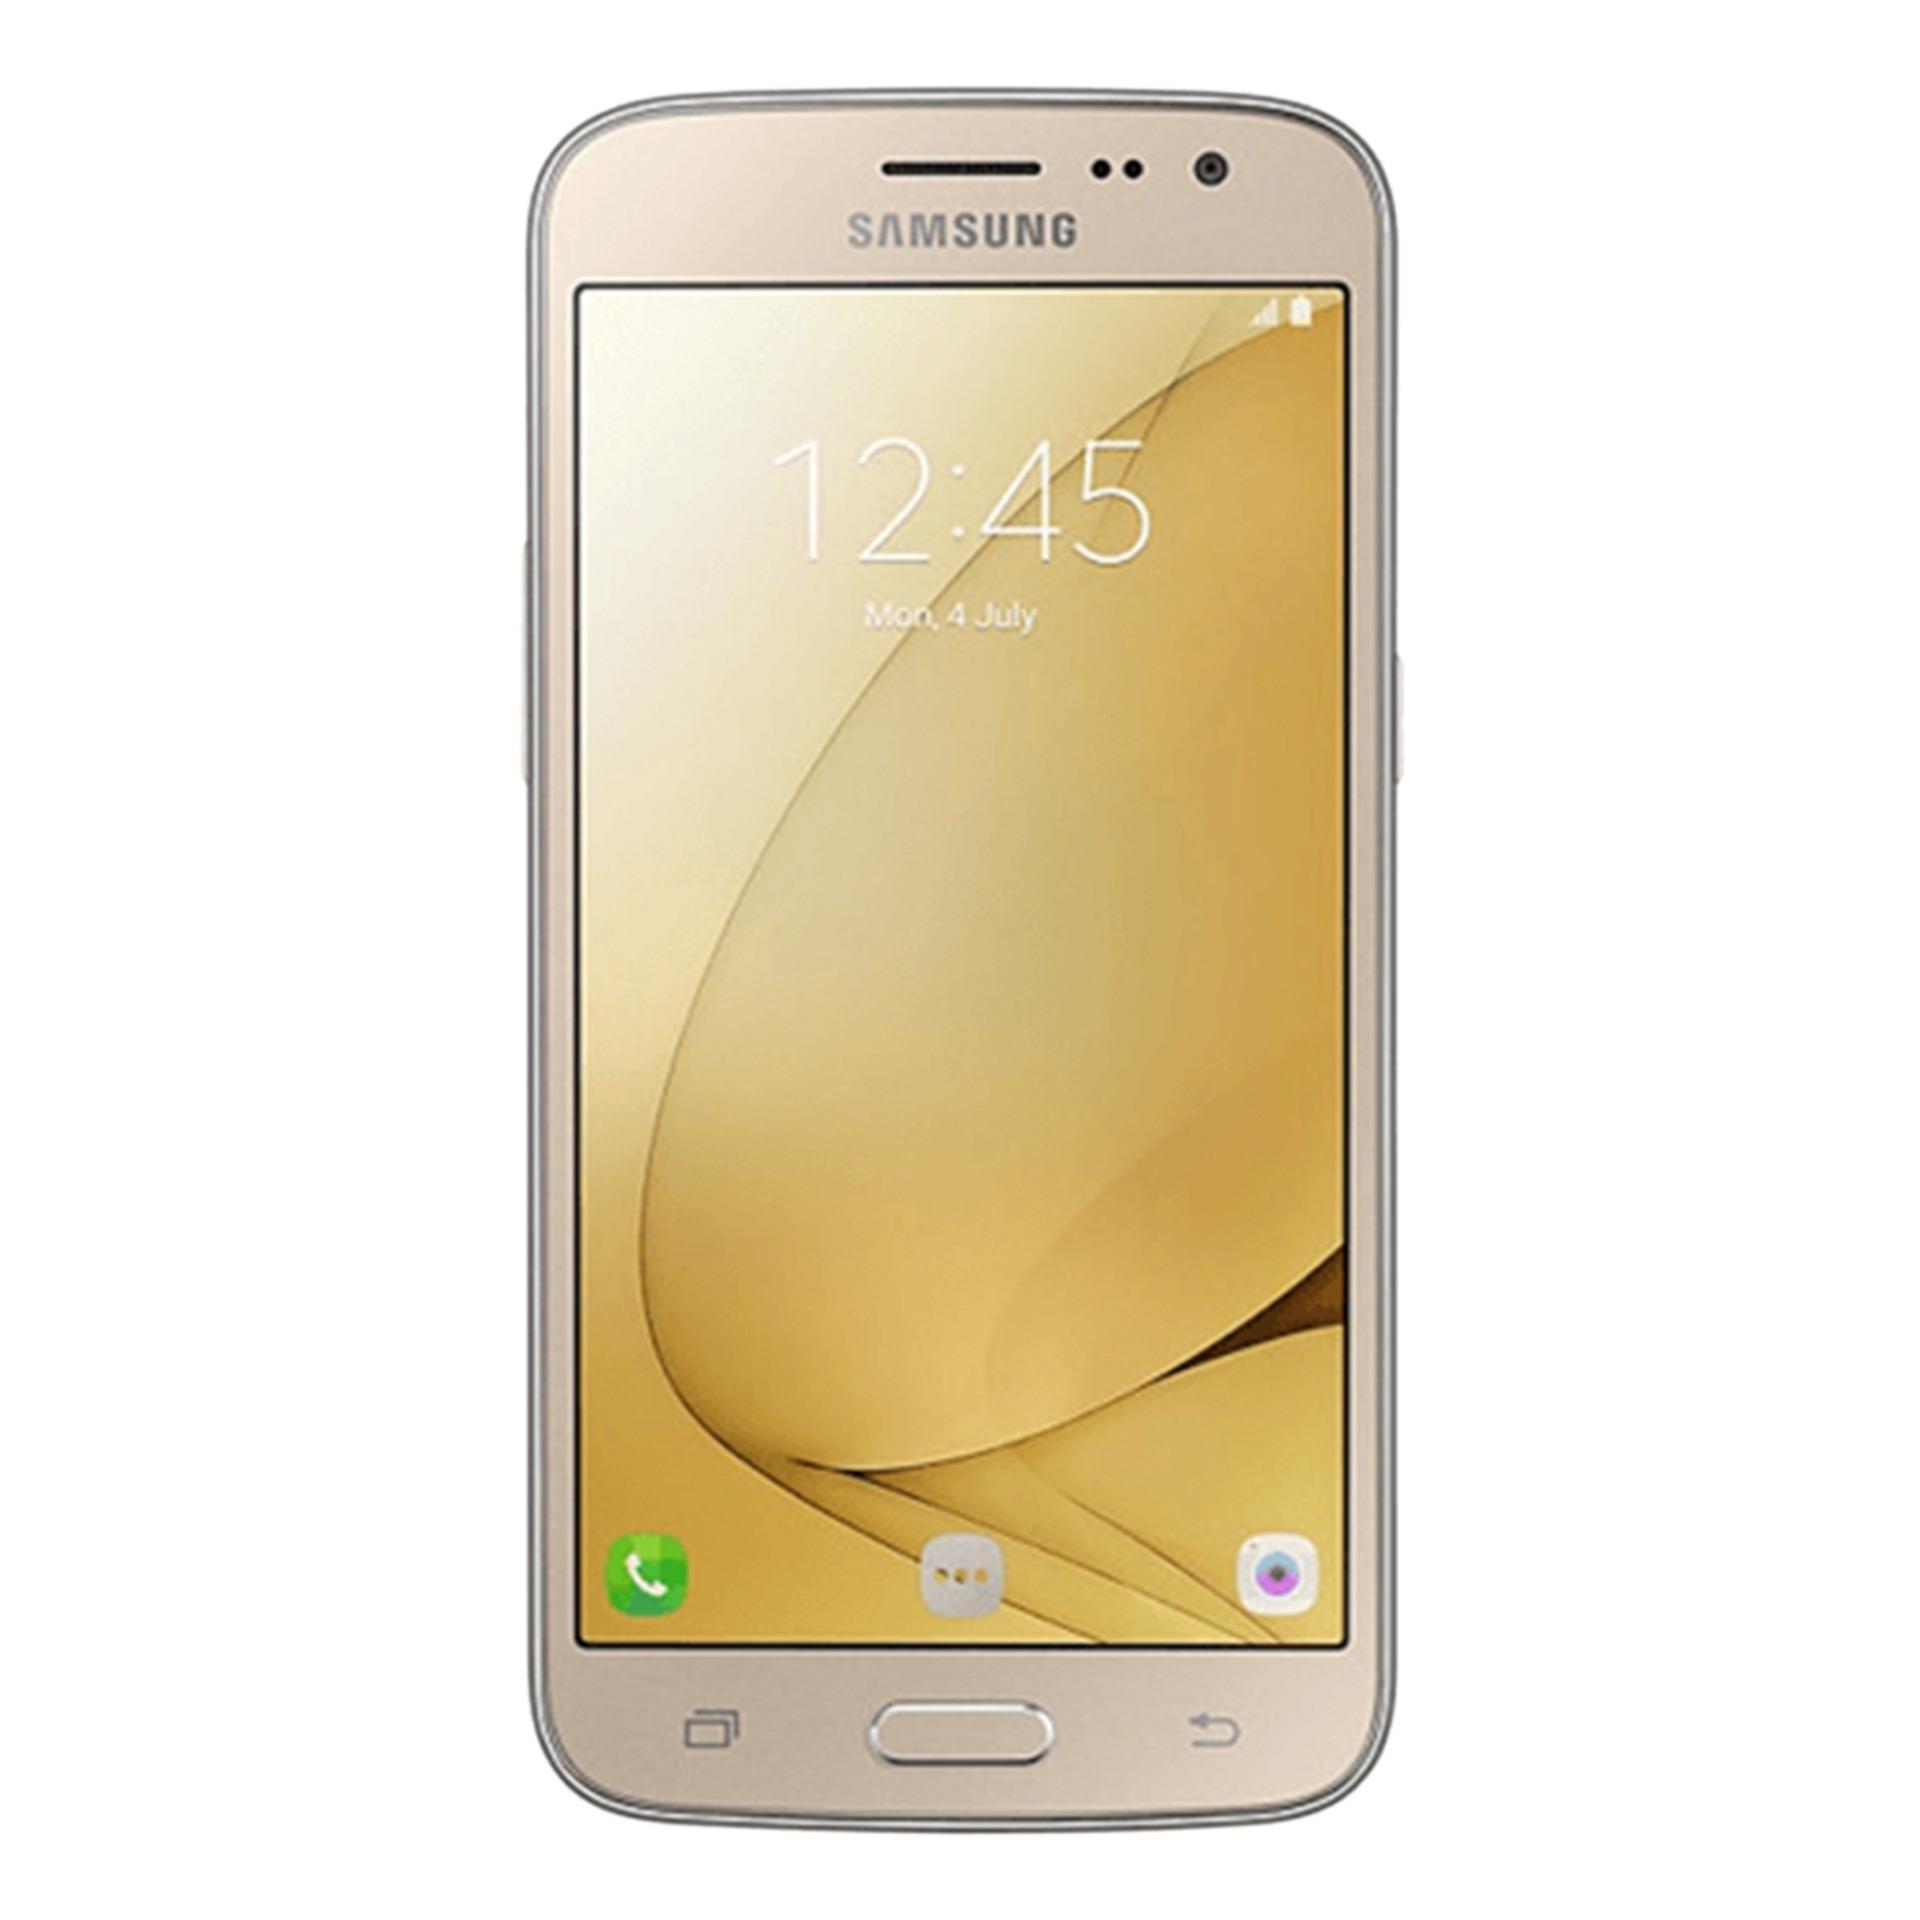 Samsung Mobile Phone In Bangladesh At Best Price Galaxy A5 New 2016 Sm Ram 2 Memori 16gb J2 Pro Smartphone 5 2gb Rom Gold